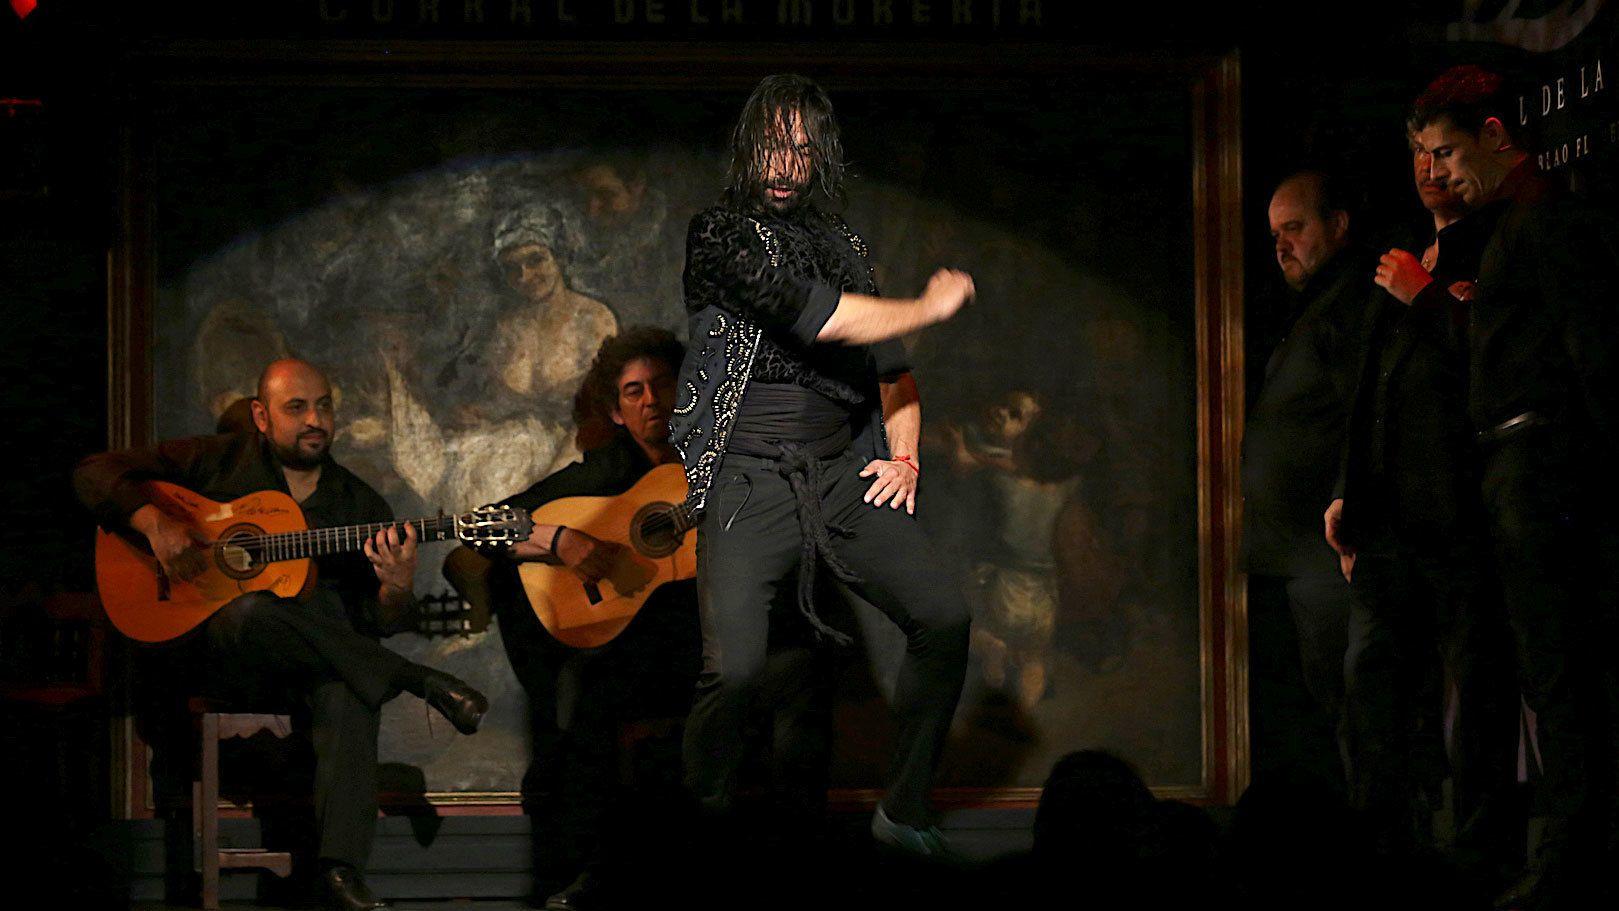 Male dancer performing at the Flamenco Show at Corral de la Moreria in Madrid